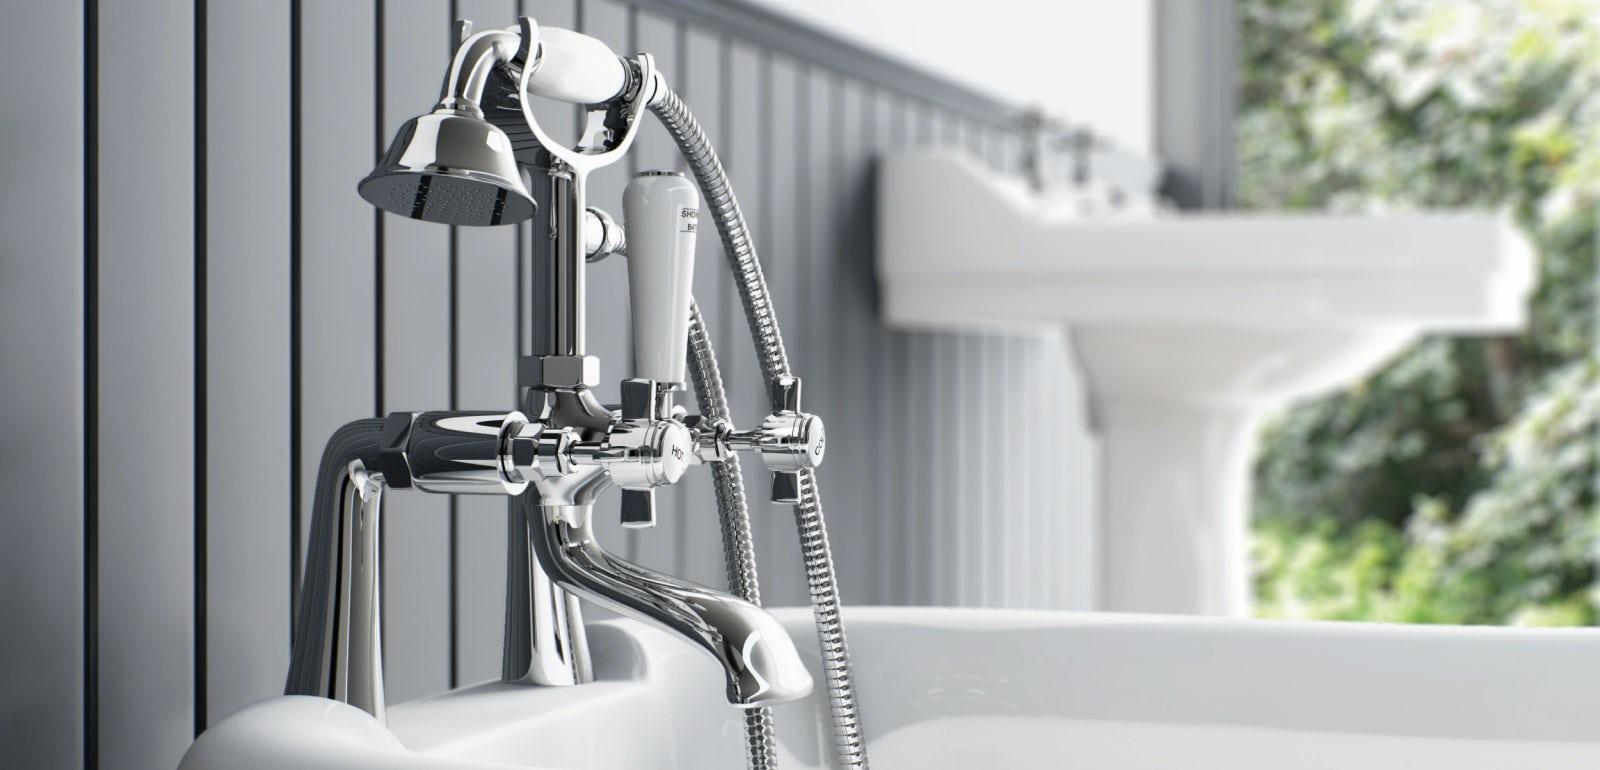 5 bath shower mixer taps for beautiful bathrooms